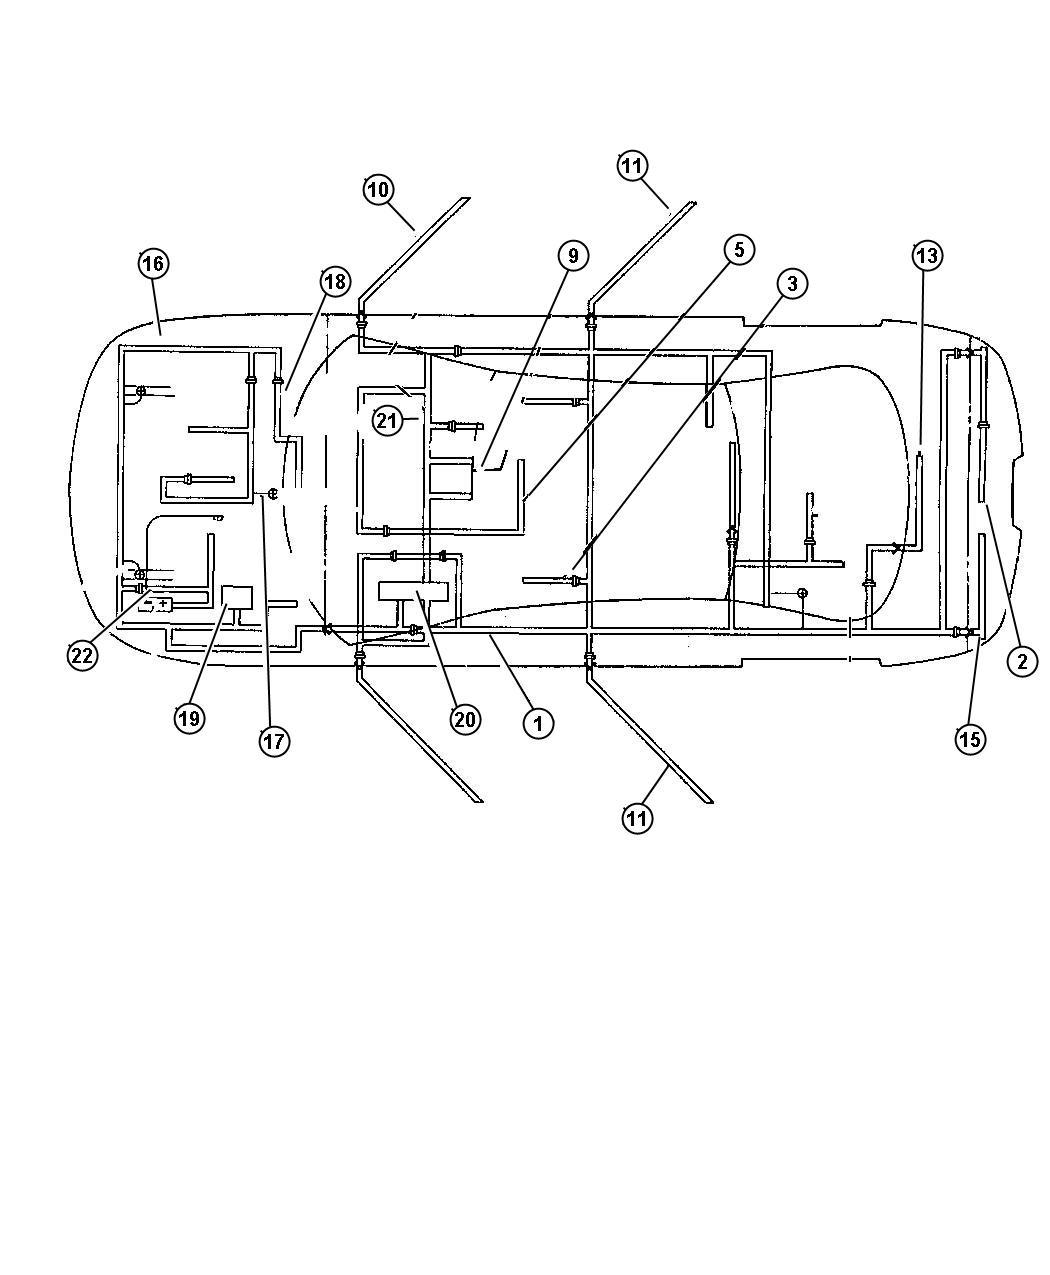 Chrysler Concorde Wiring  Body Left  With 360 Watt Amp